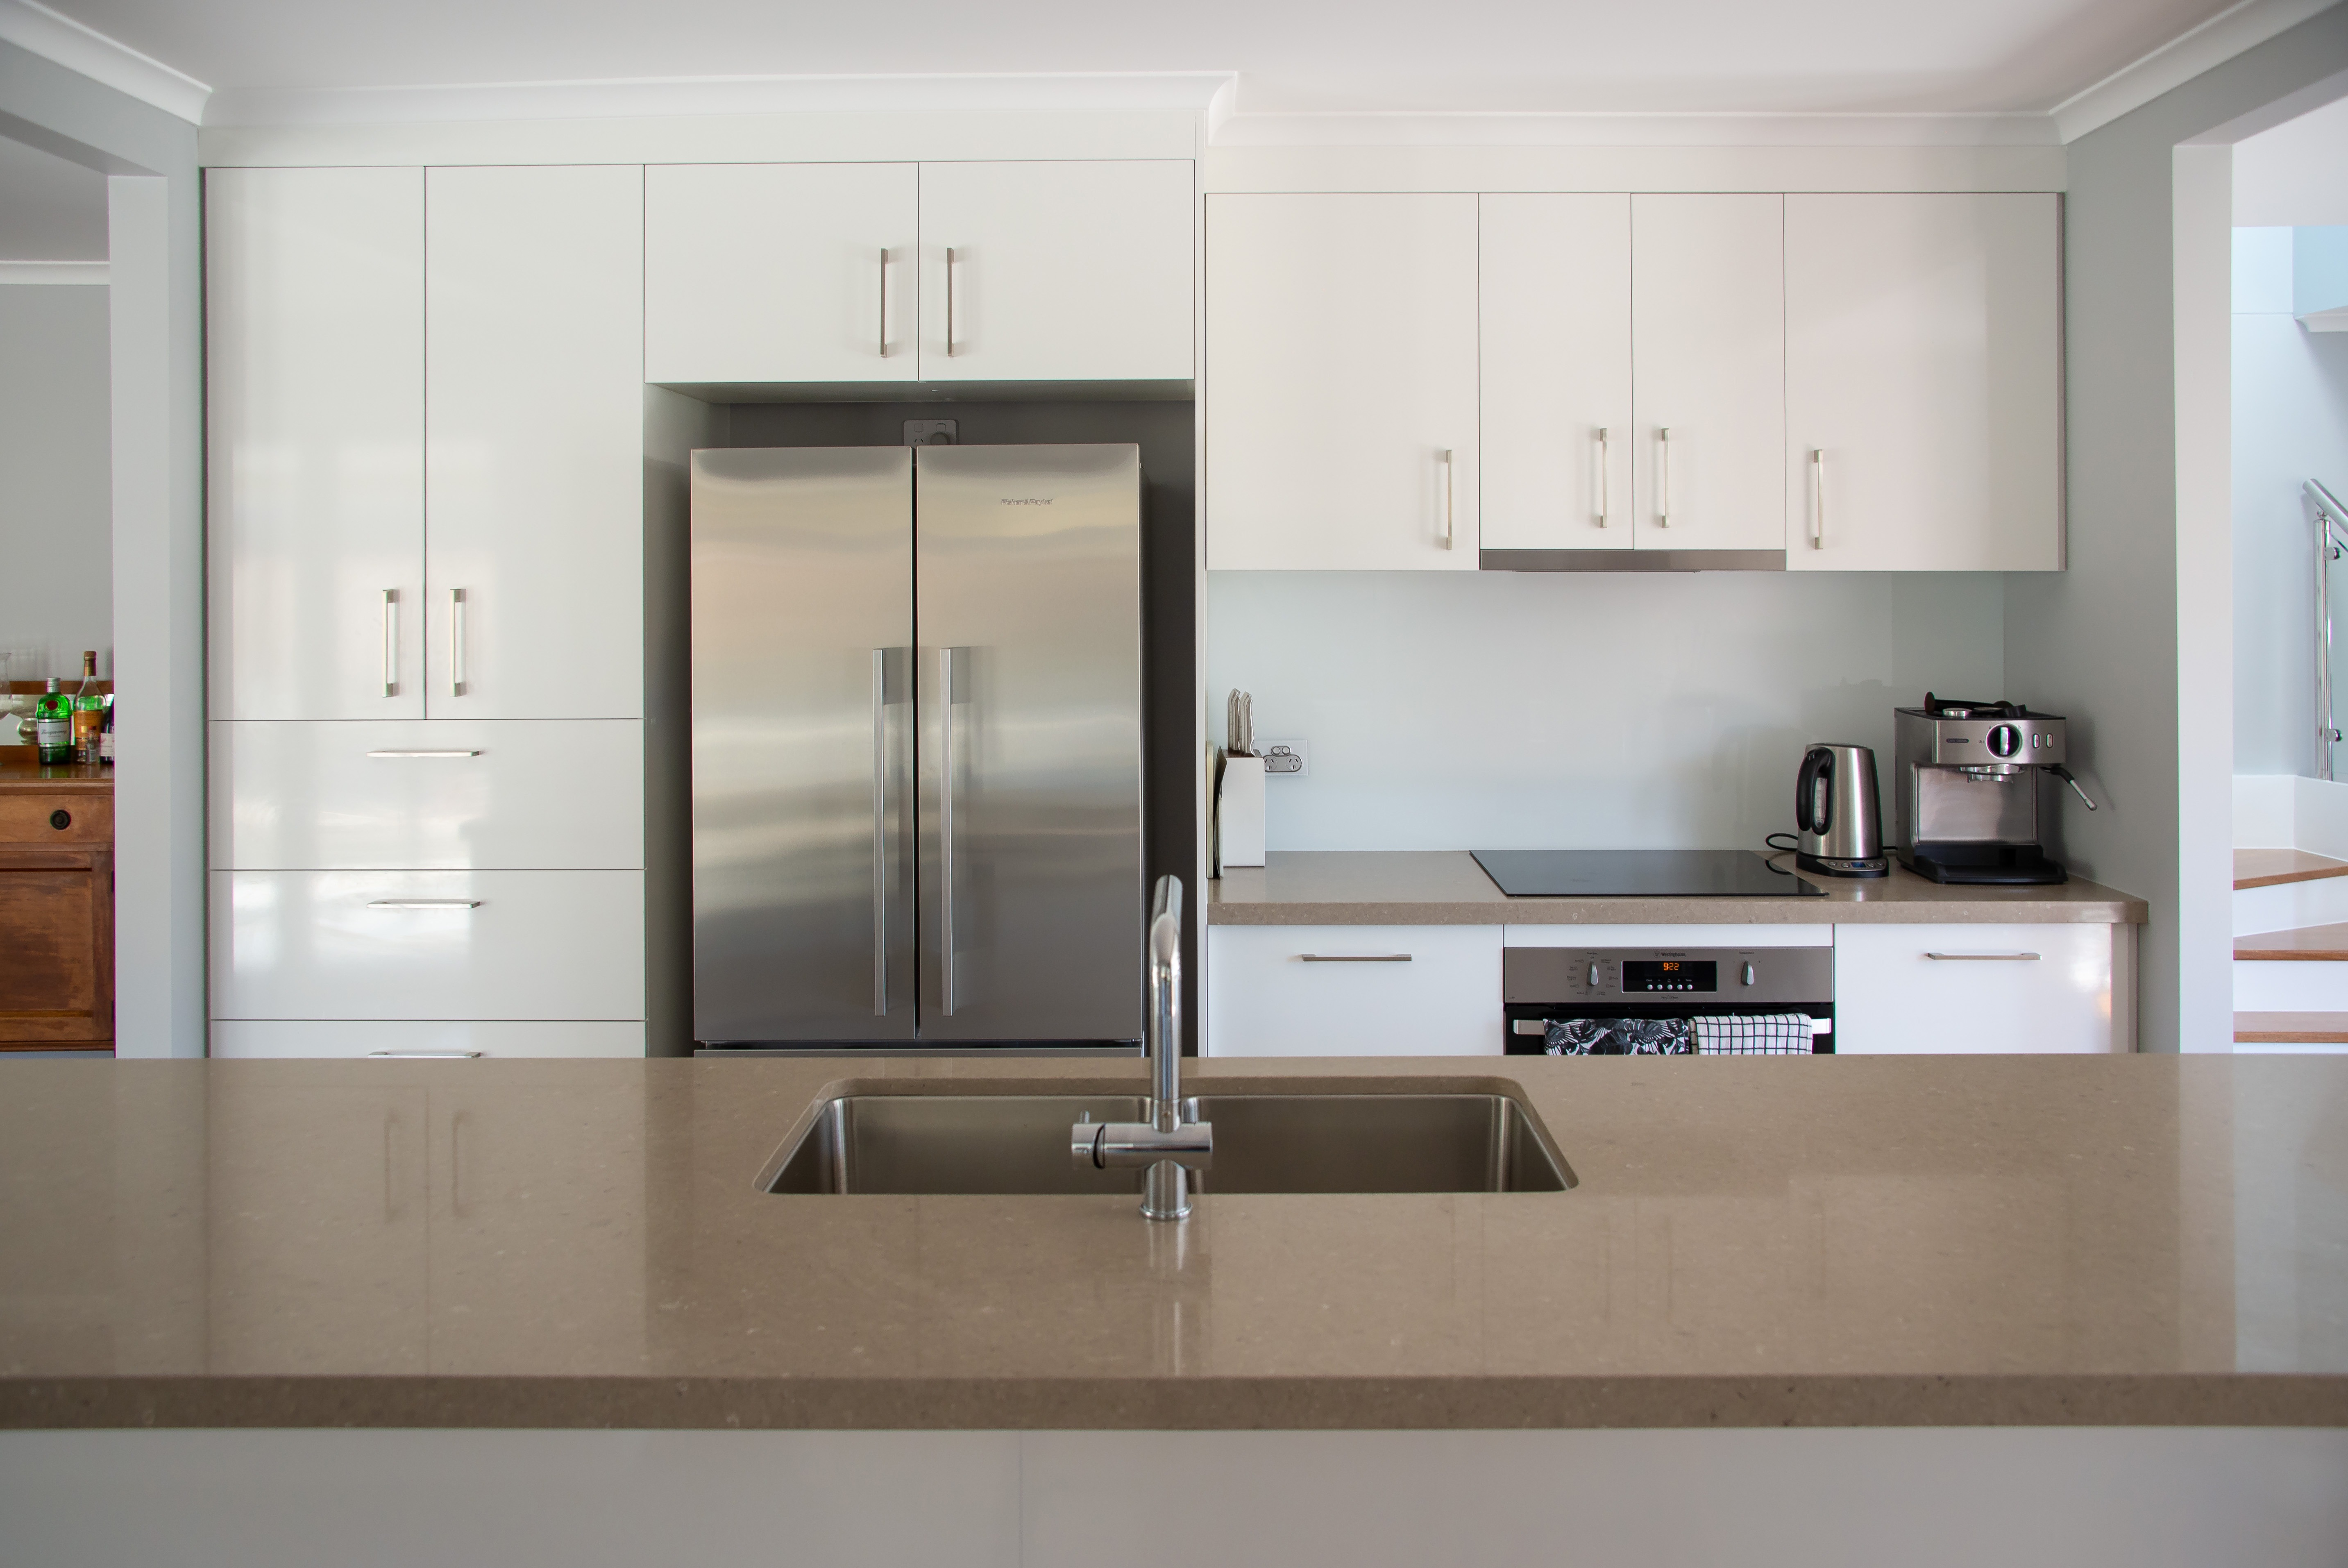 A Freshly Renovated Kitchen